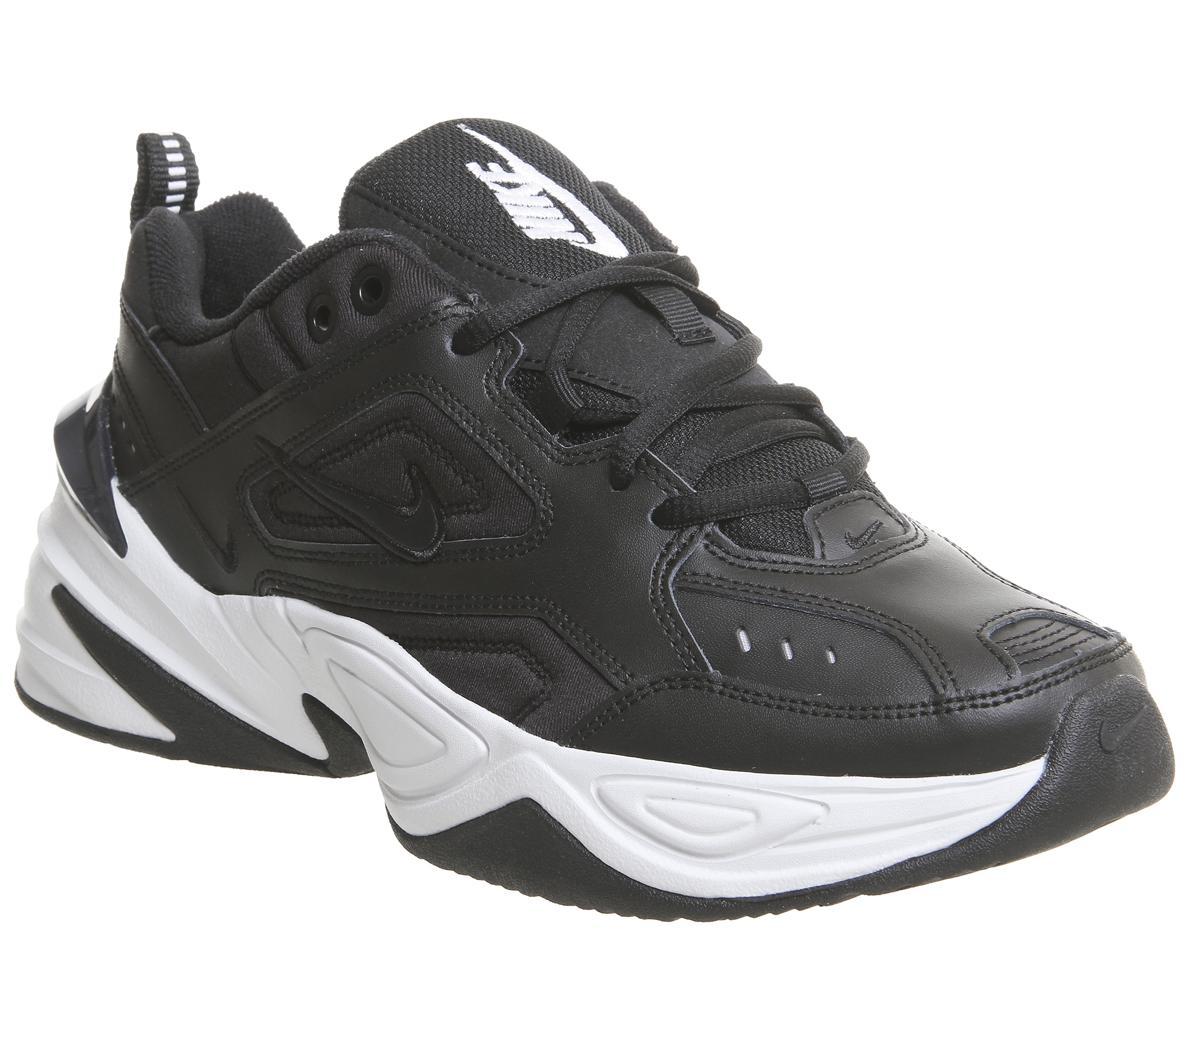 Nike M2k Tekno Trainers Black White F